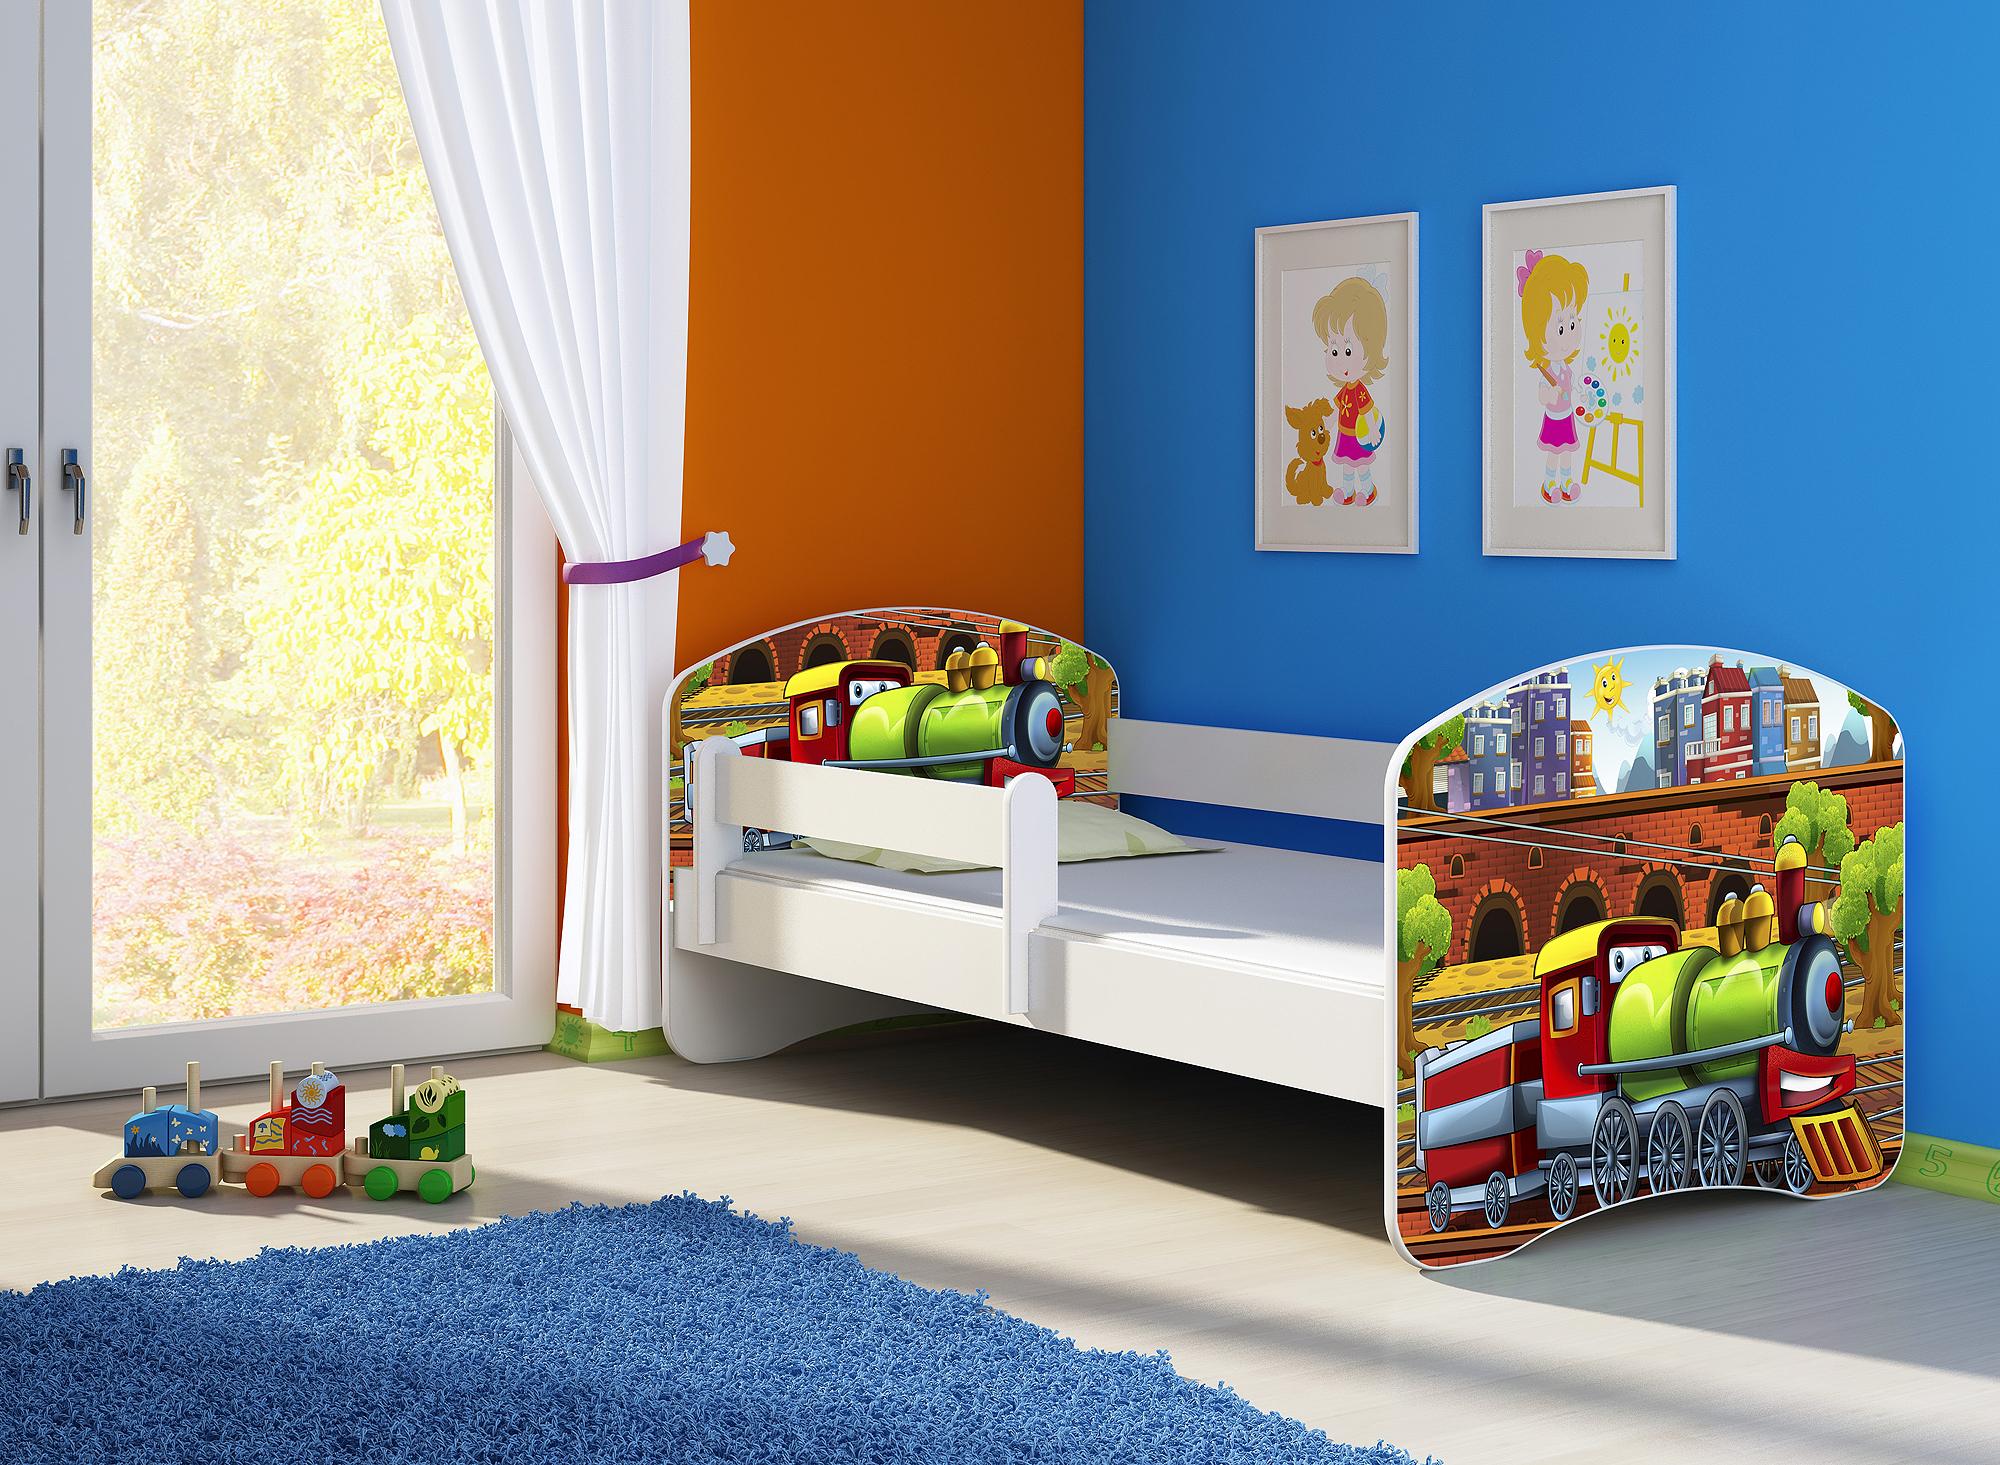 kinderbett fantasia clamaro in zwei gr en w hlbar mit oder ohne vorname ihres kind alles f r 39 s. Black Bedroom Furniture Sets. Home Design Ideas